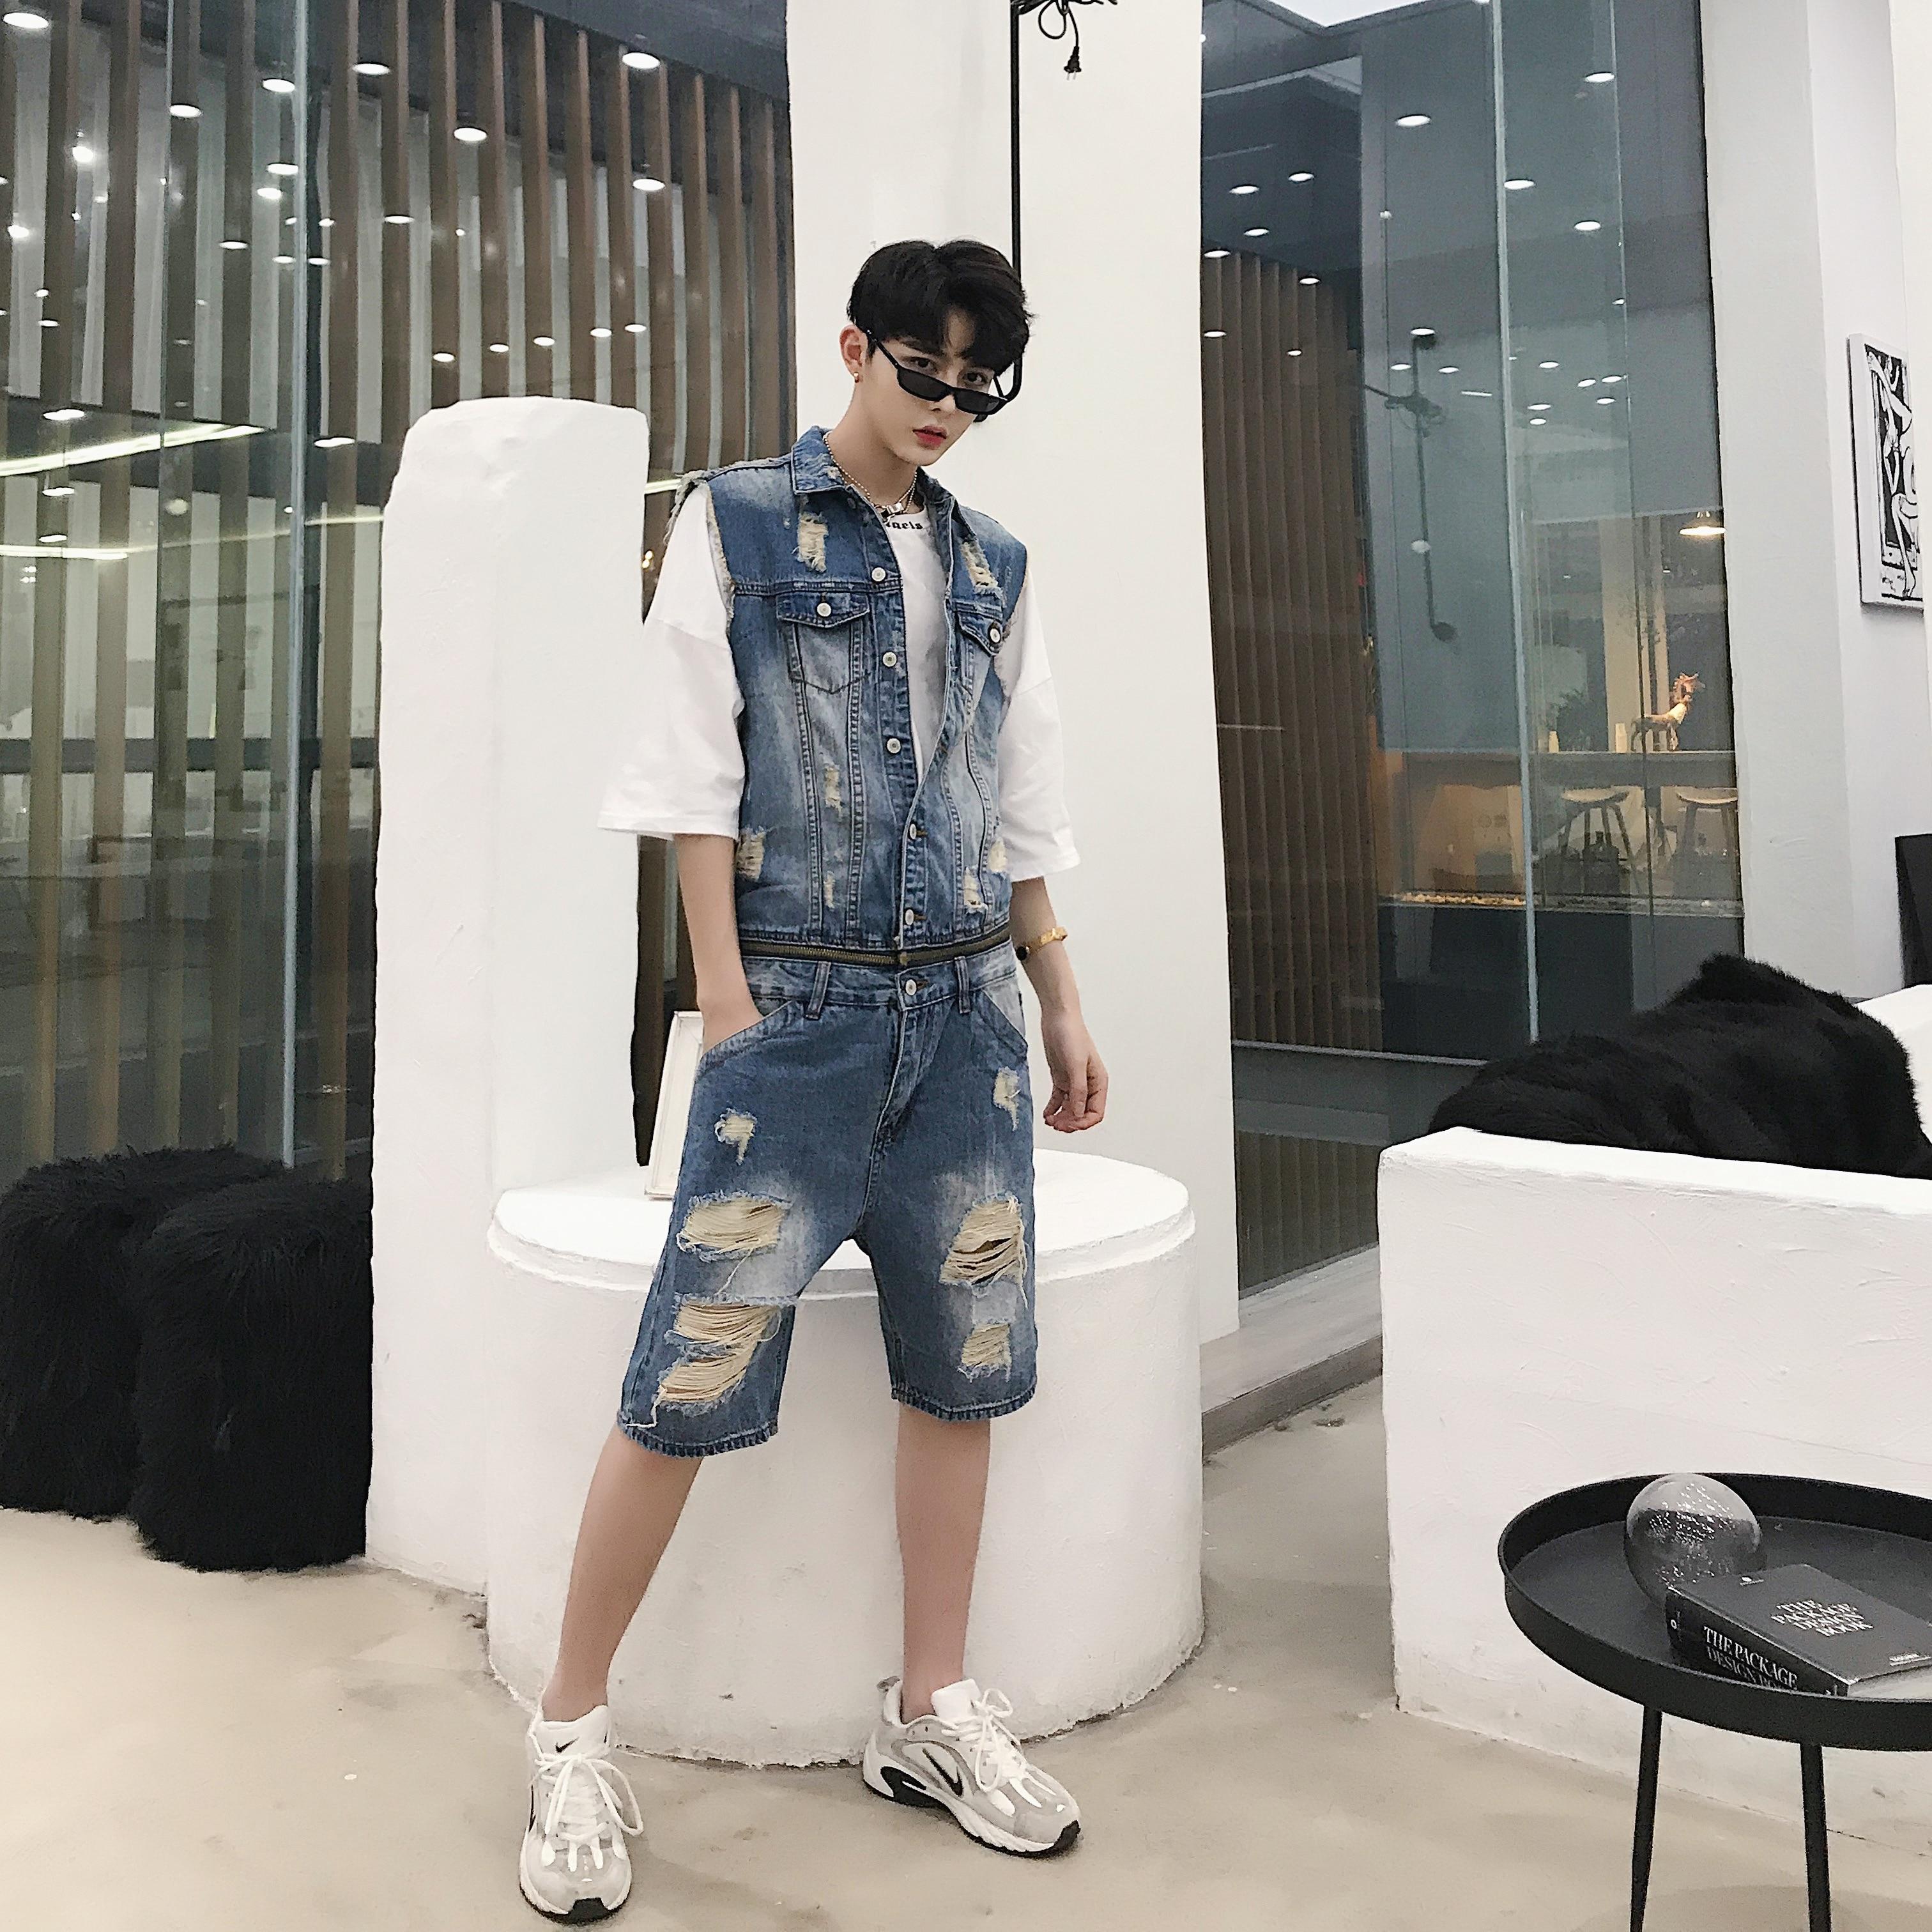 Men Sleeveless Casual Jeans Jumpsuit Male Slim Fit Denim Hole Half Pants Overalls Tooling Jumpsuit Hiphop Fashion Trousers